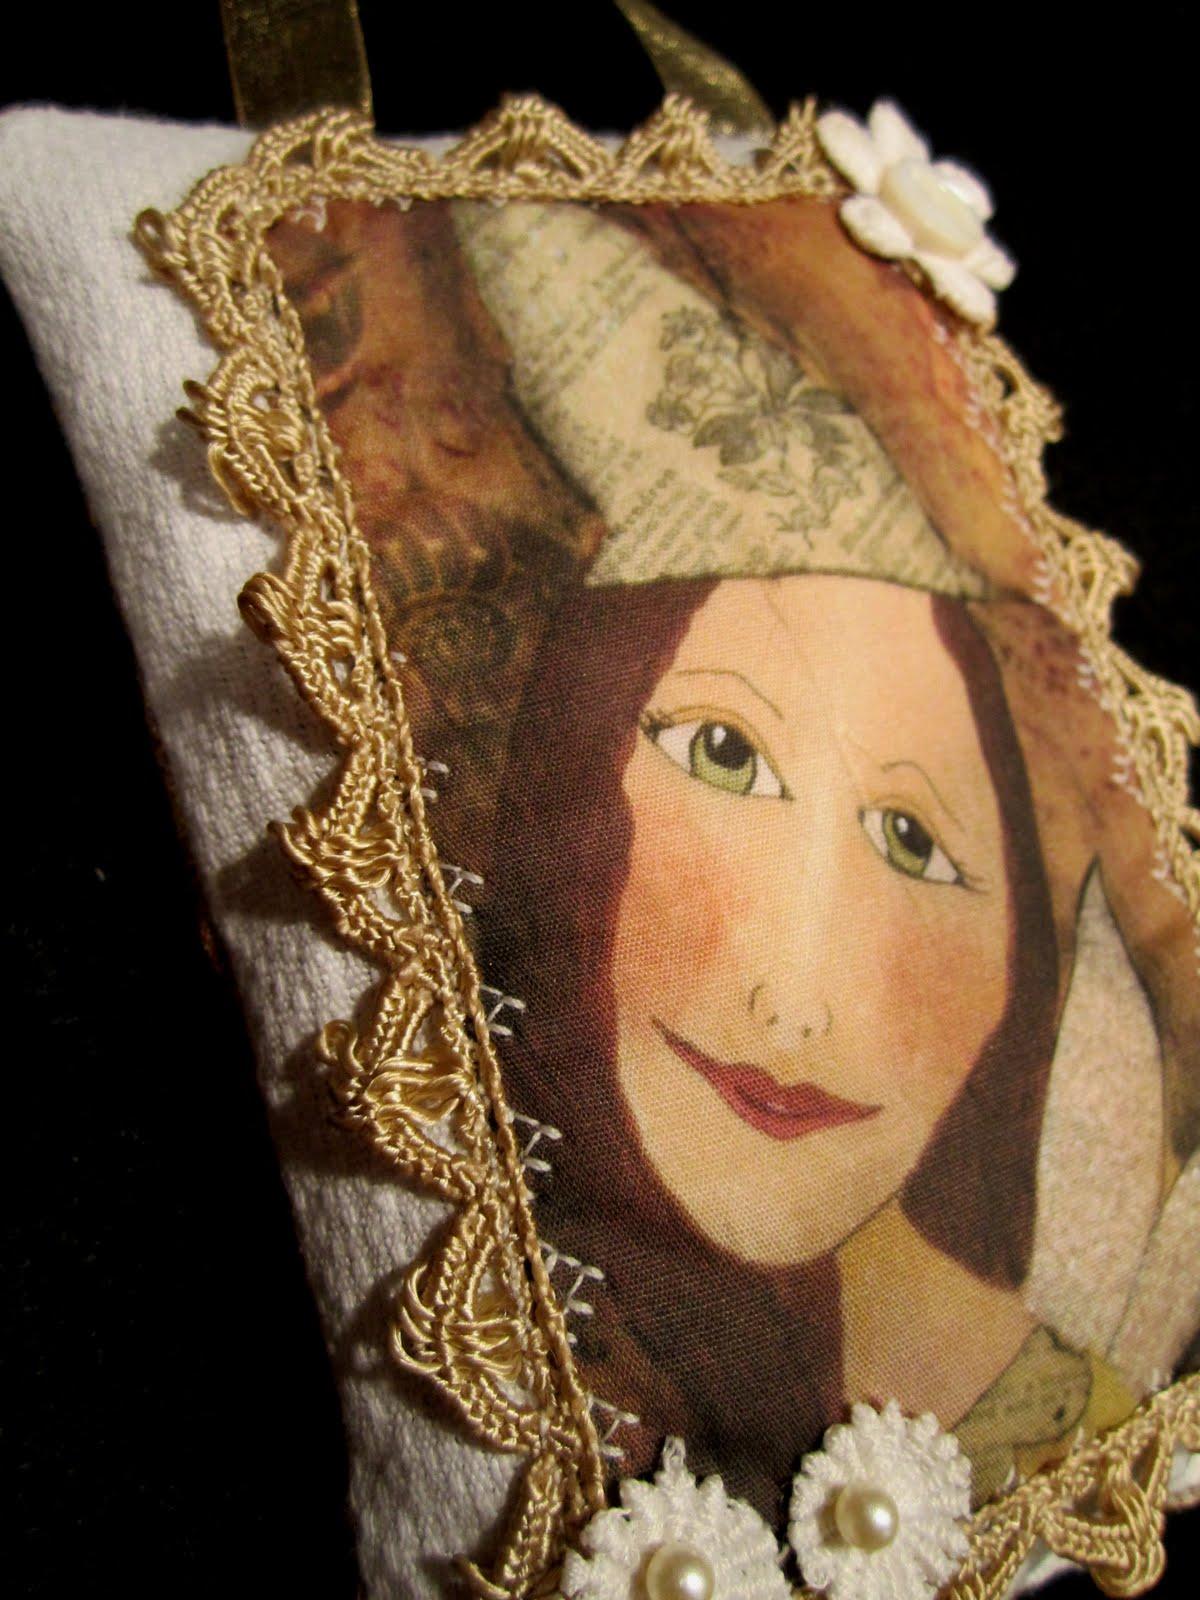 Victorian Sachet Pillows : Gollywobbles: Victorian Lavender filled pillow sachets